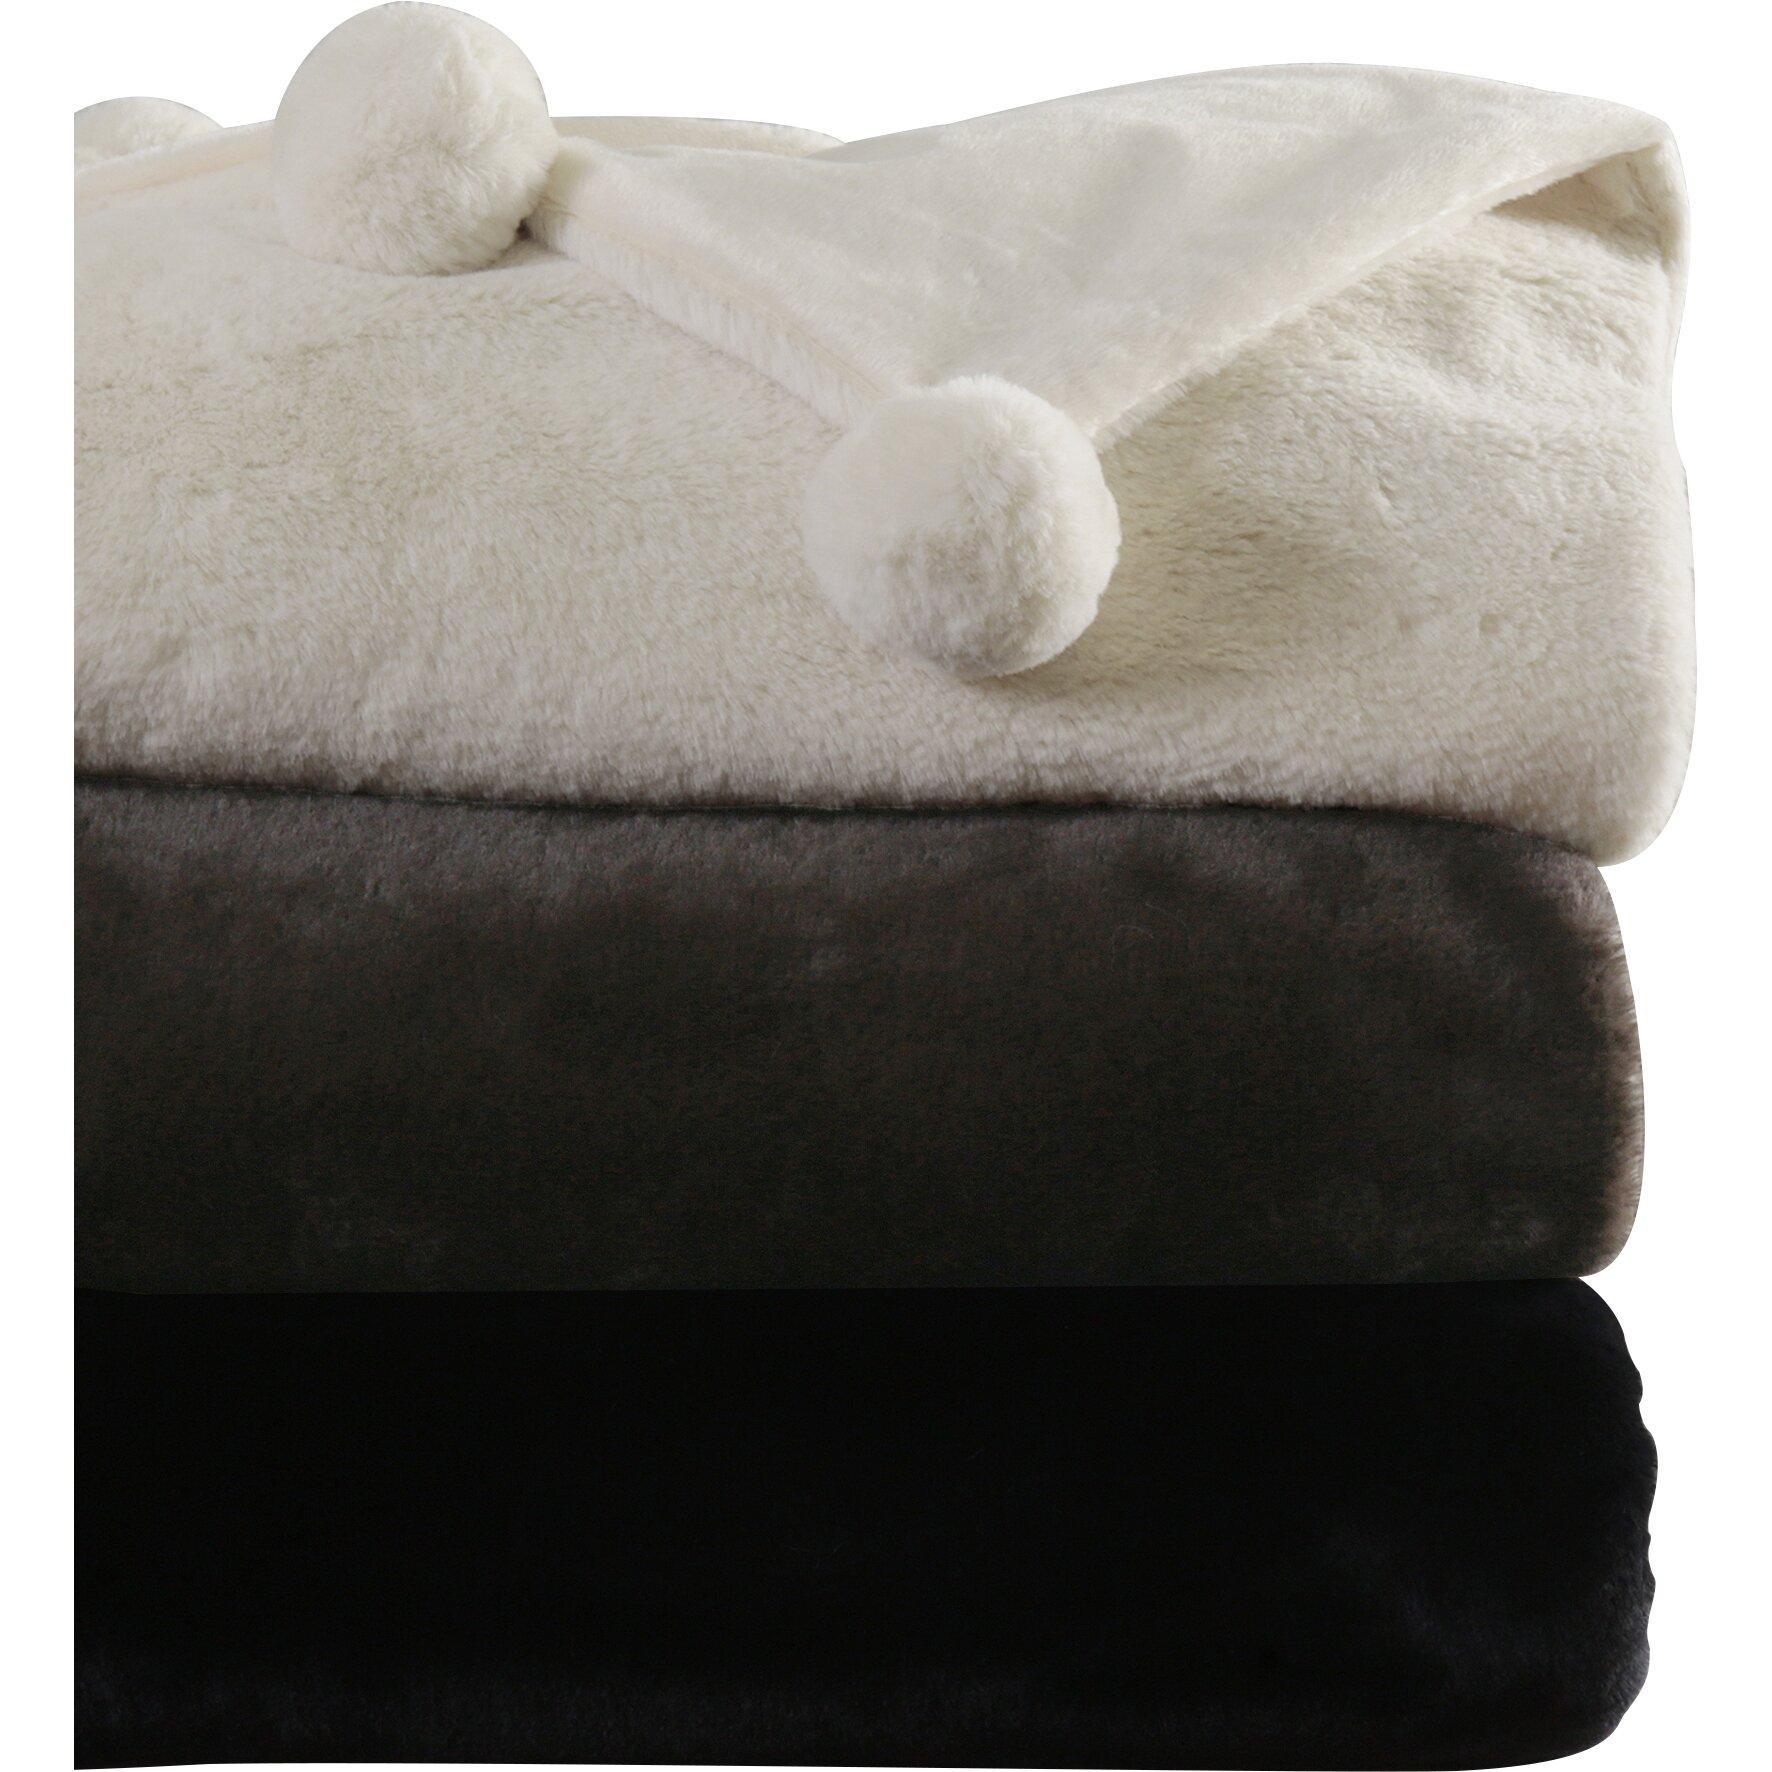 Best Home Fashion Inc Luxe Faux Fur Pom Pom Throw